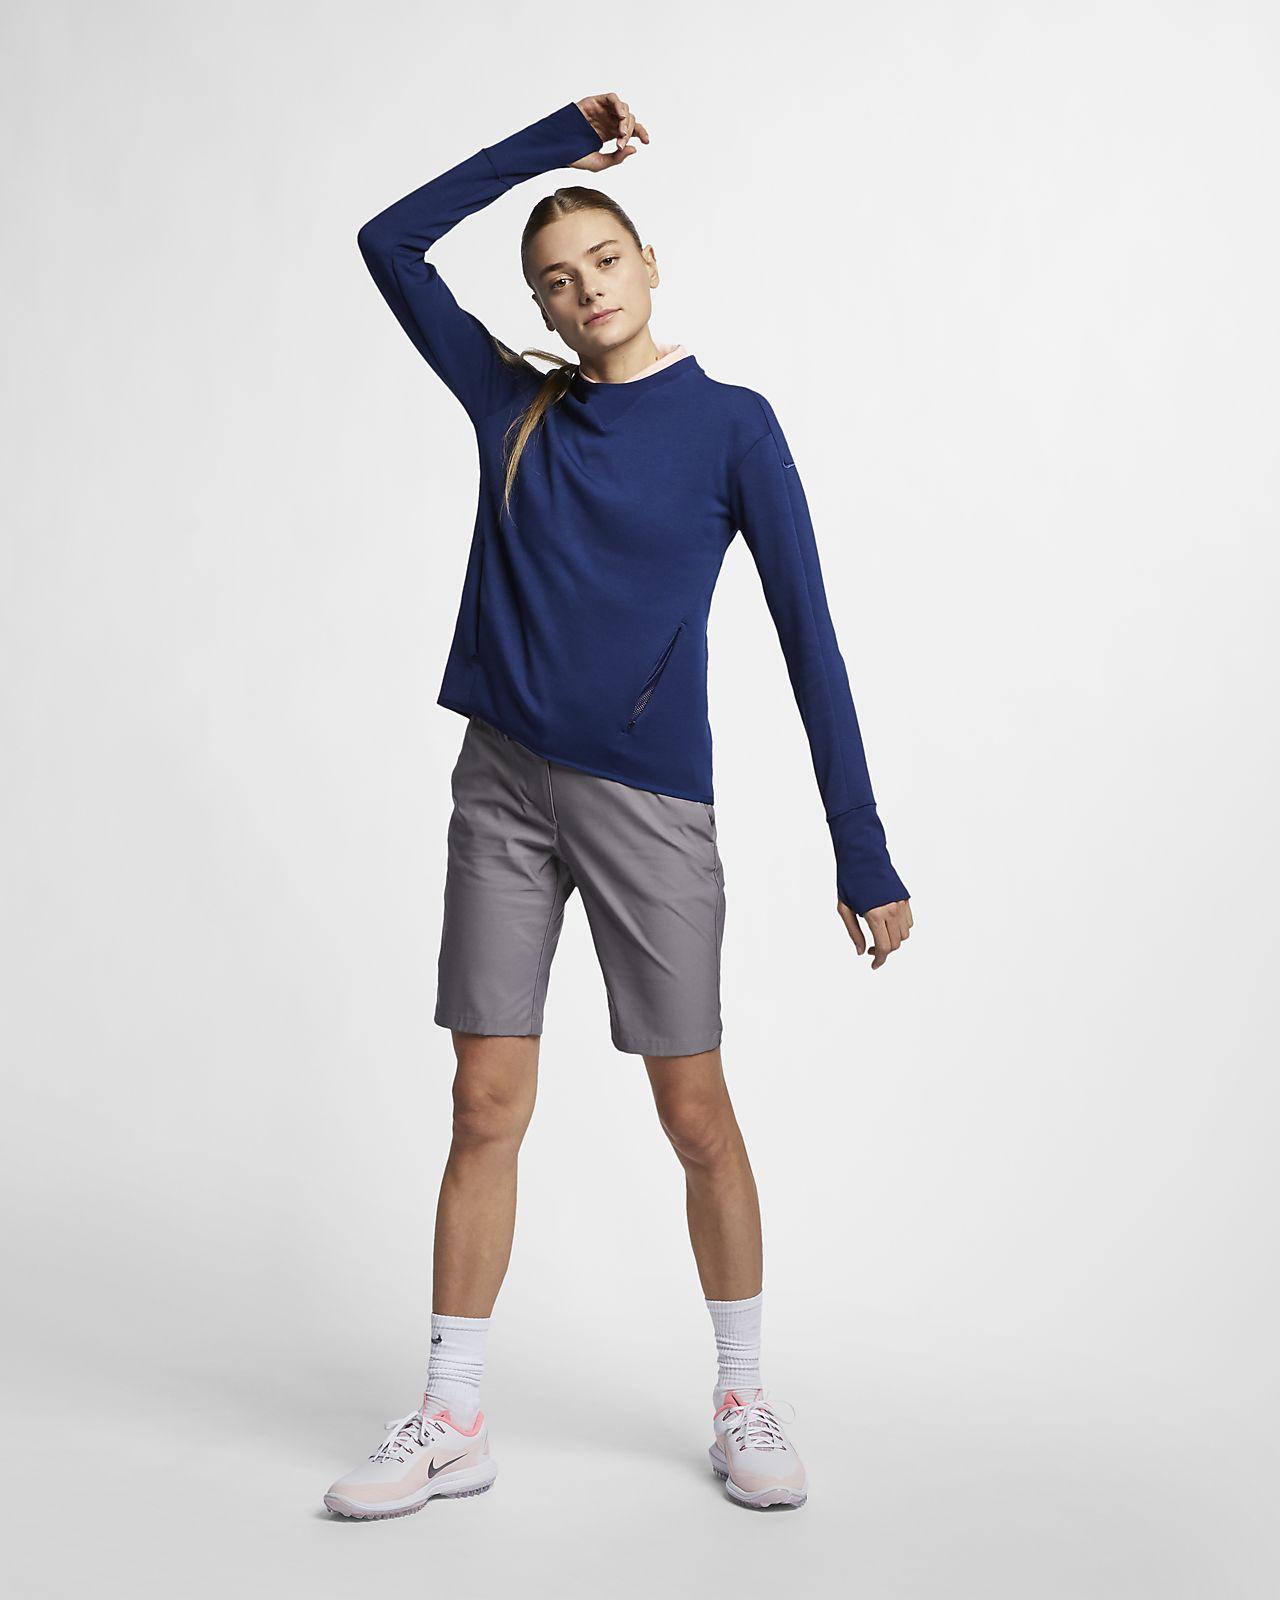 9a23fb4f Nike Dri-FIT UV Women's Long-Sleeve Golf Top. Nike.com